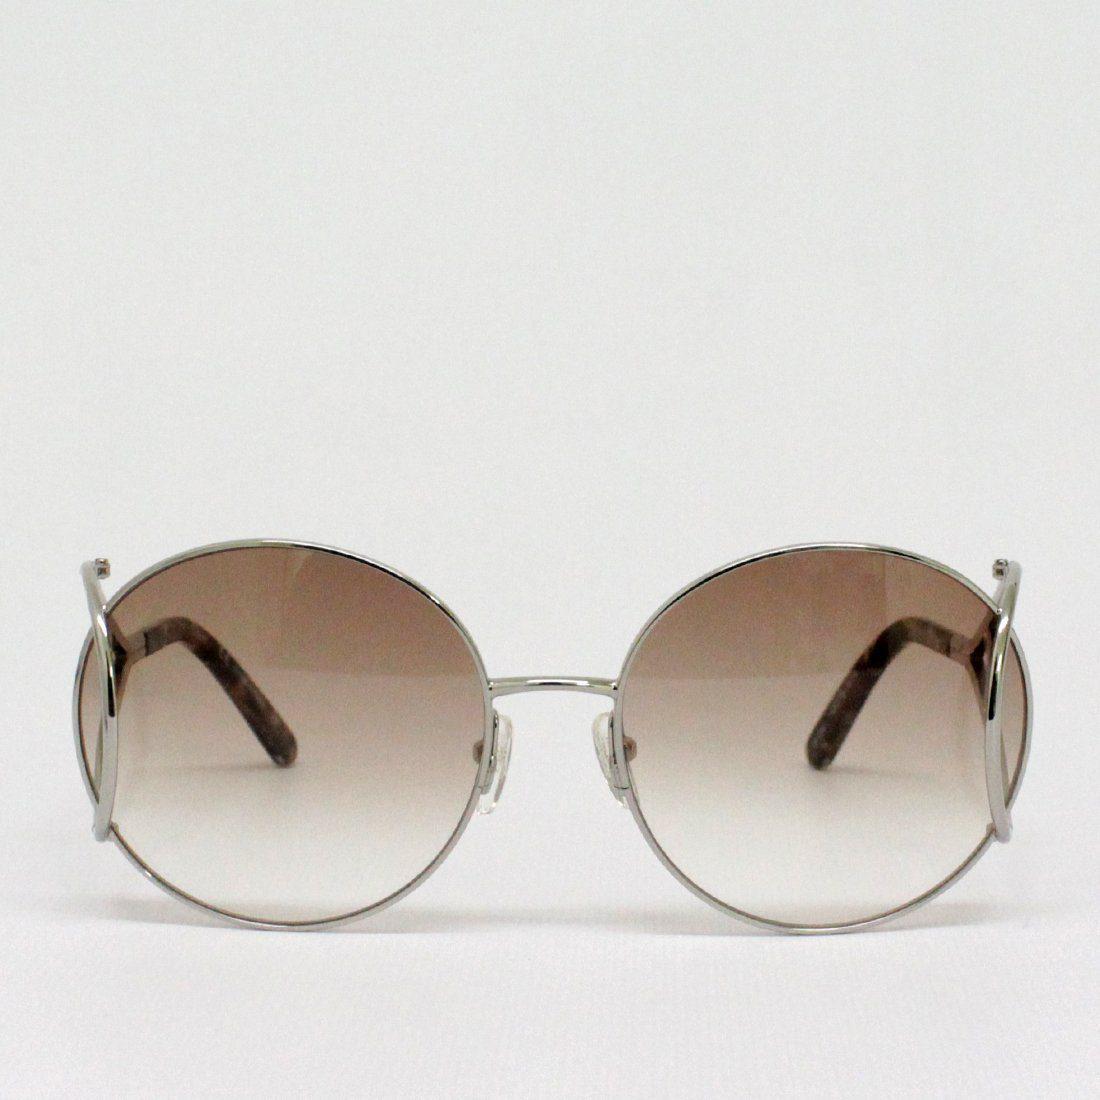 Gold Jackson sunglasses Chlo w6ghc4KKS